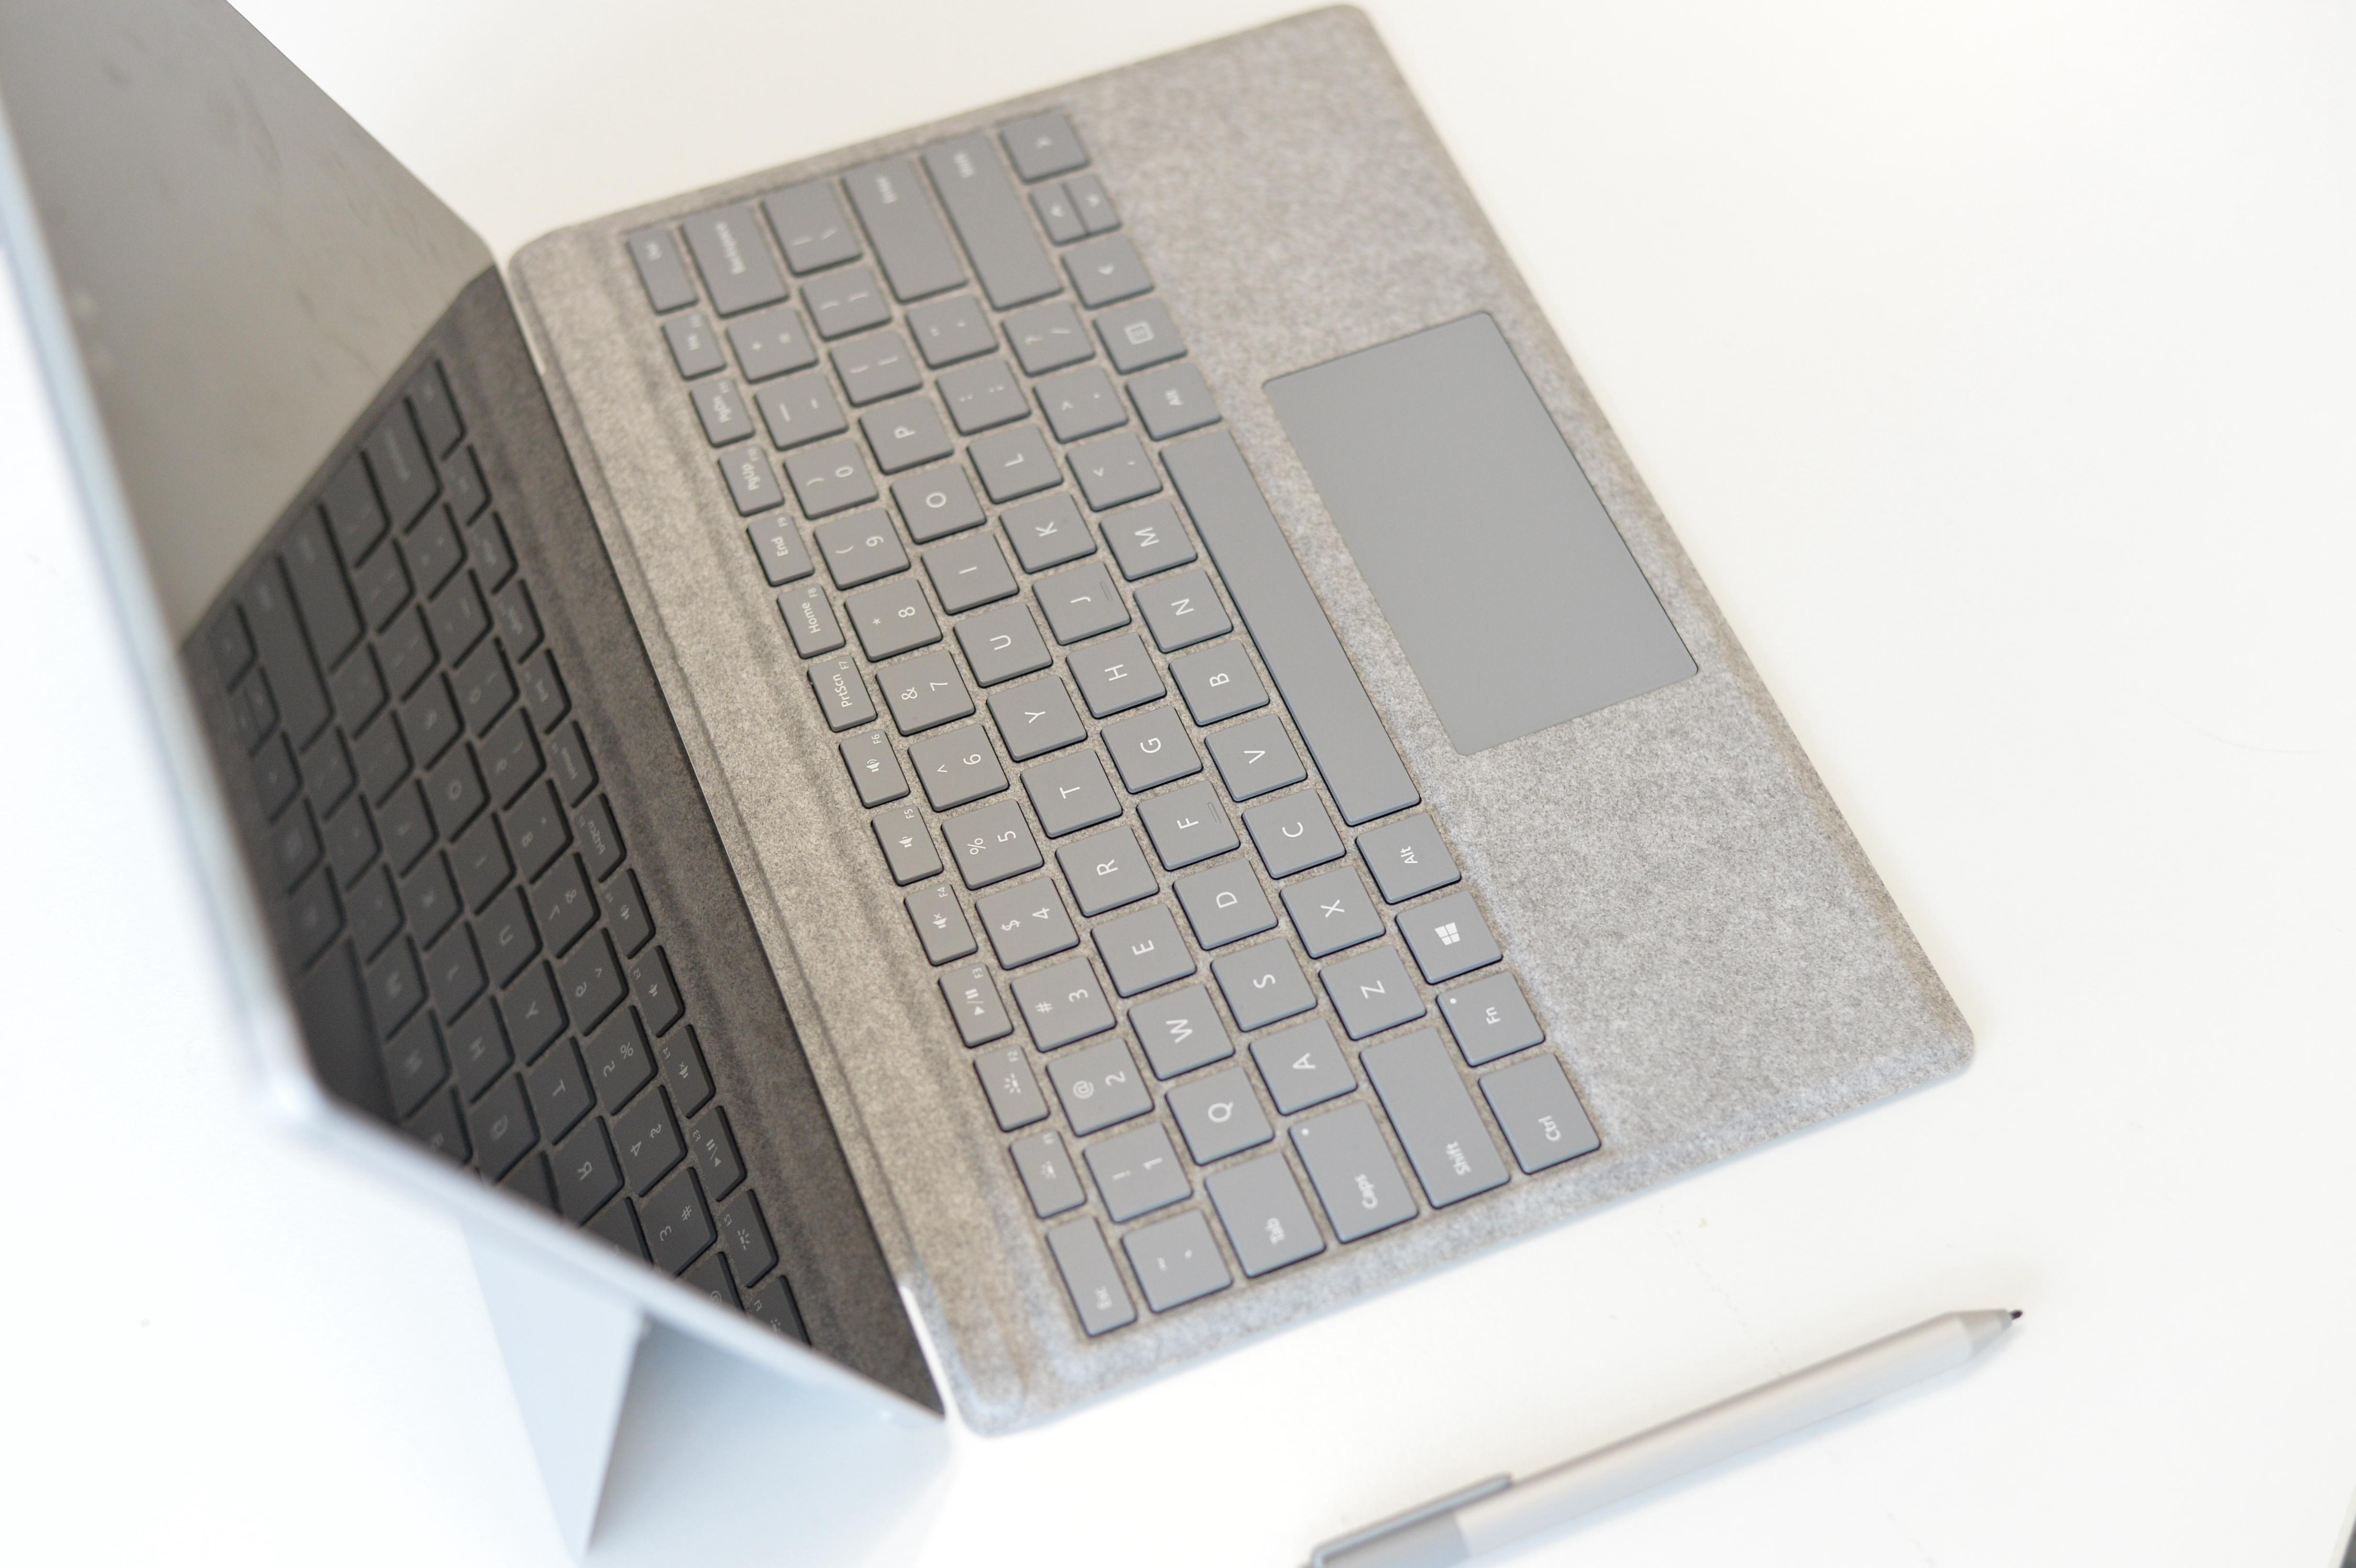 Surface Pro 4 Alcantara特制版键盘上线的照片 - 6